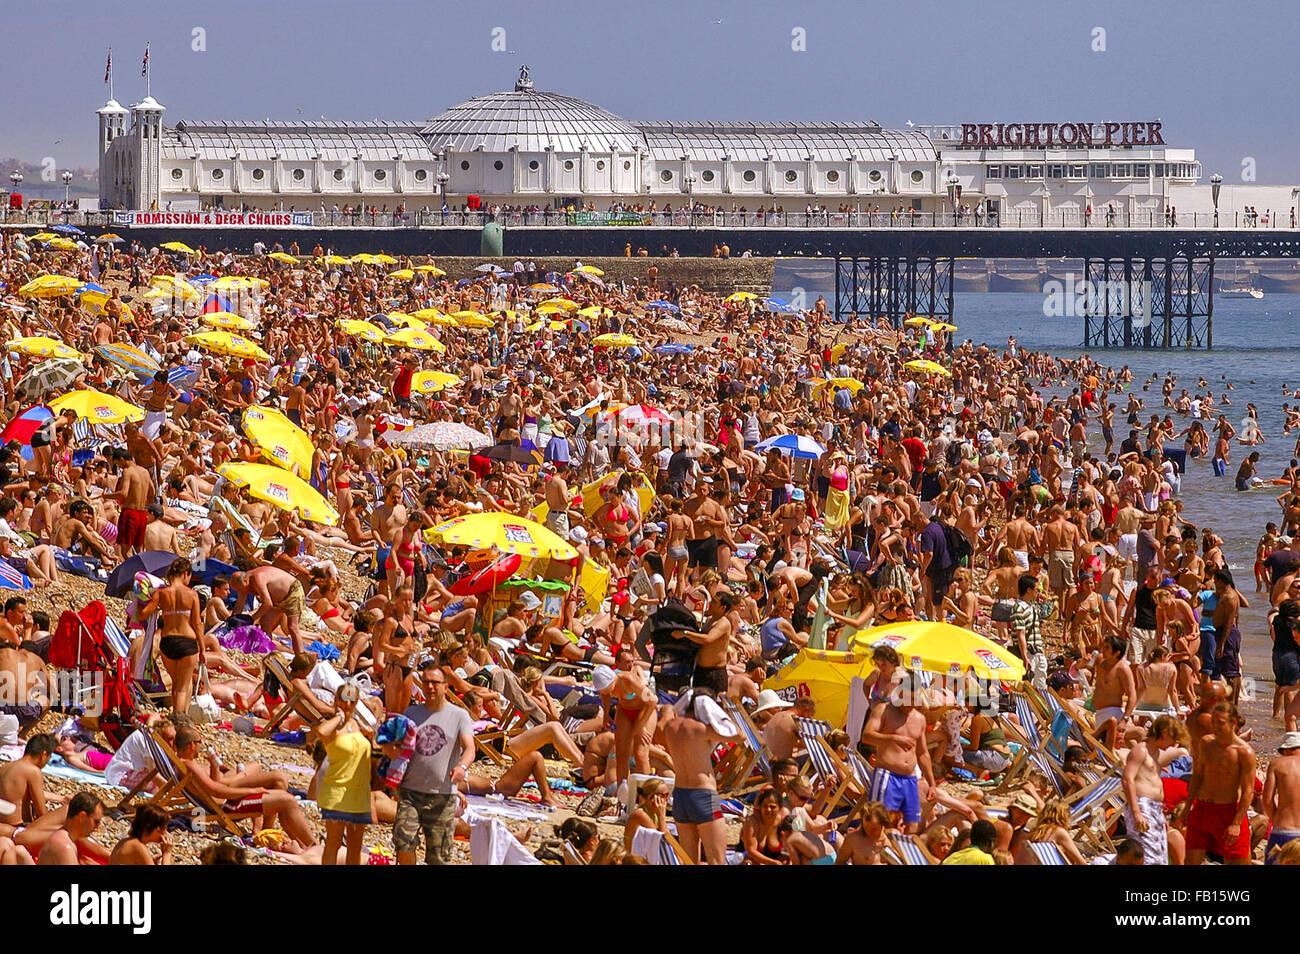 Crowded Brighton beach. - Stock Image